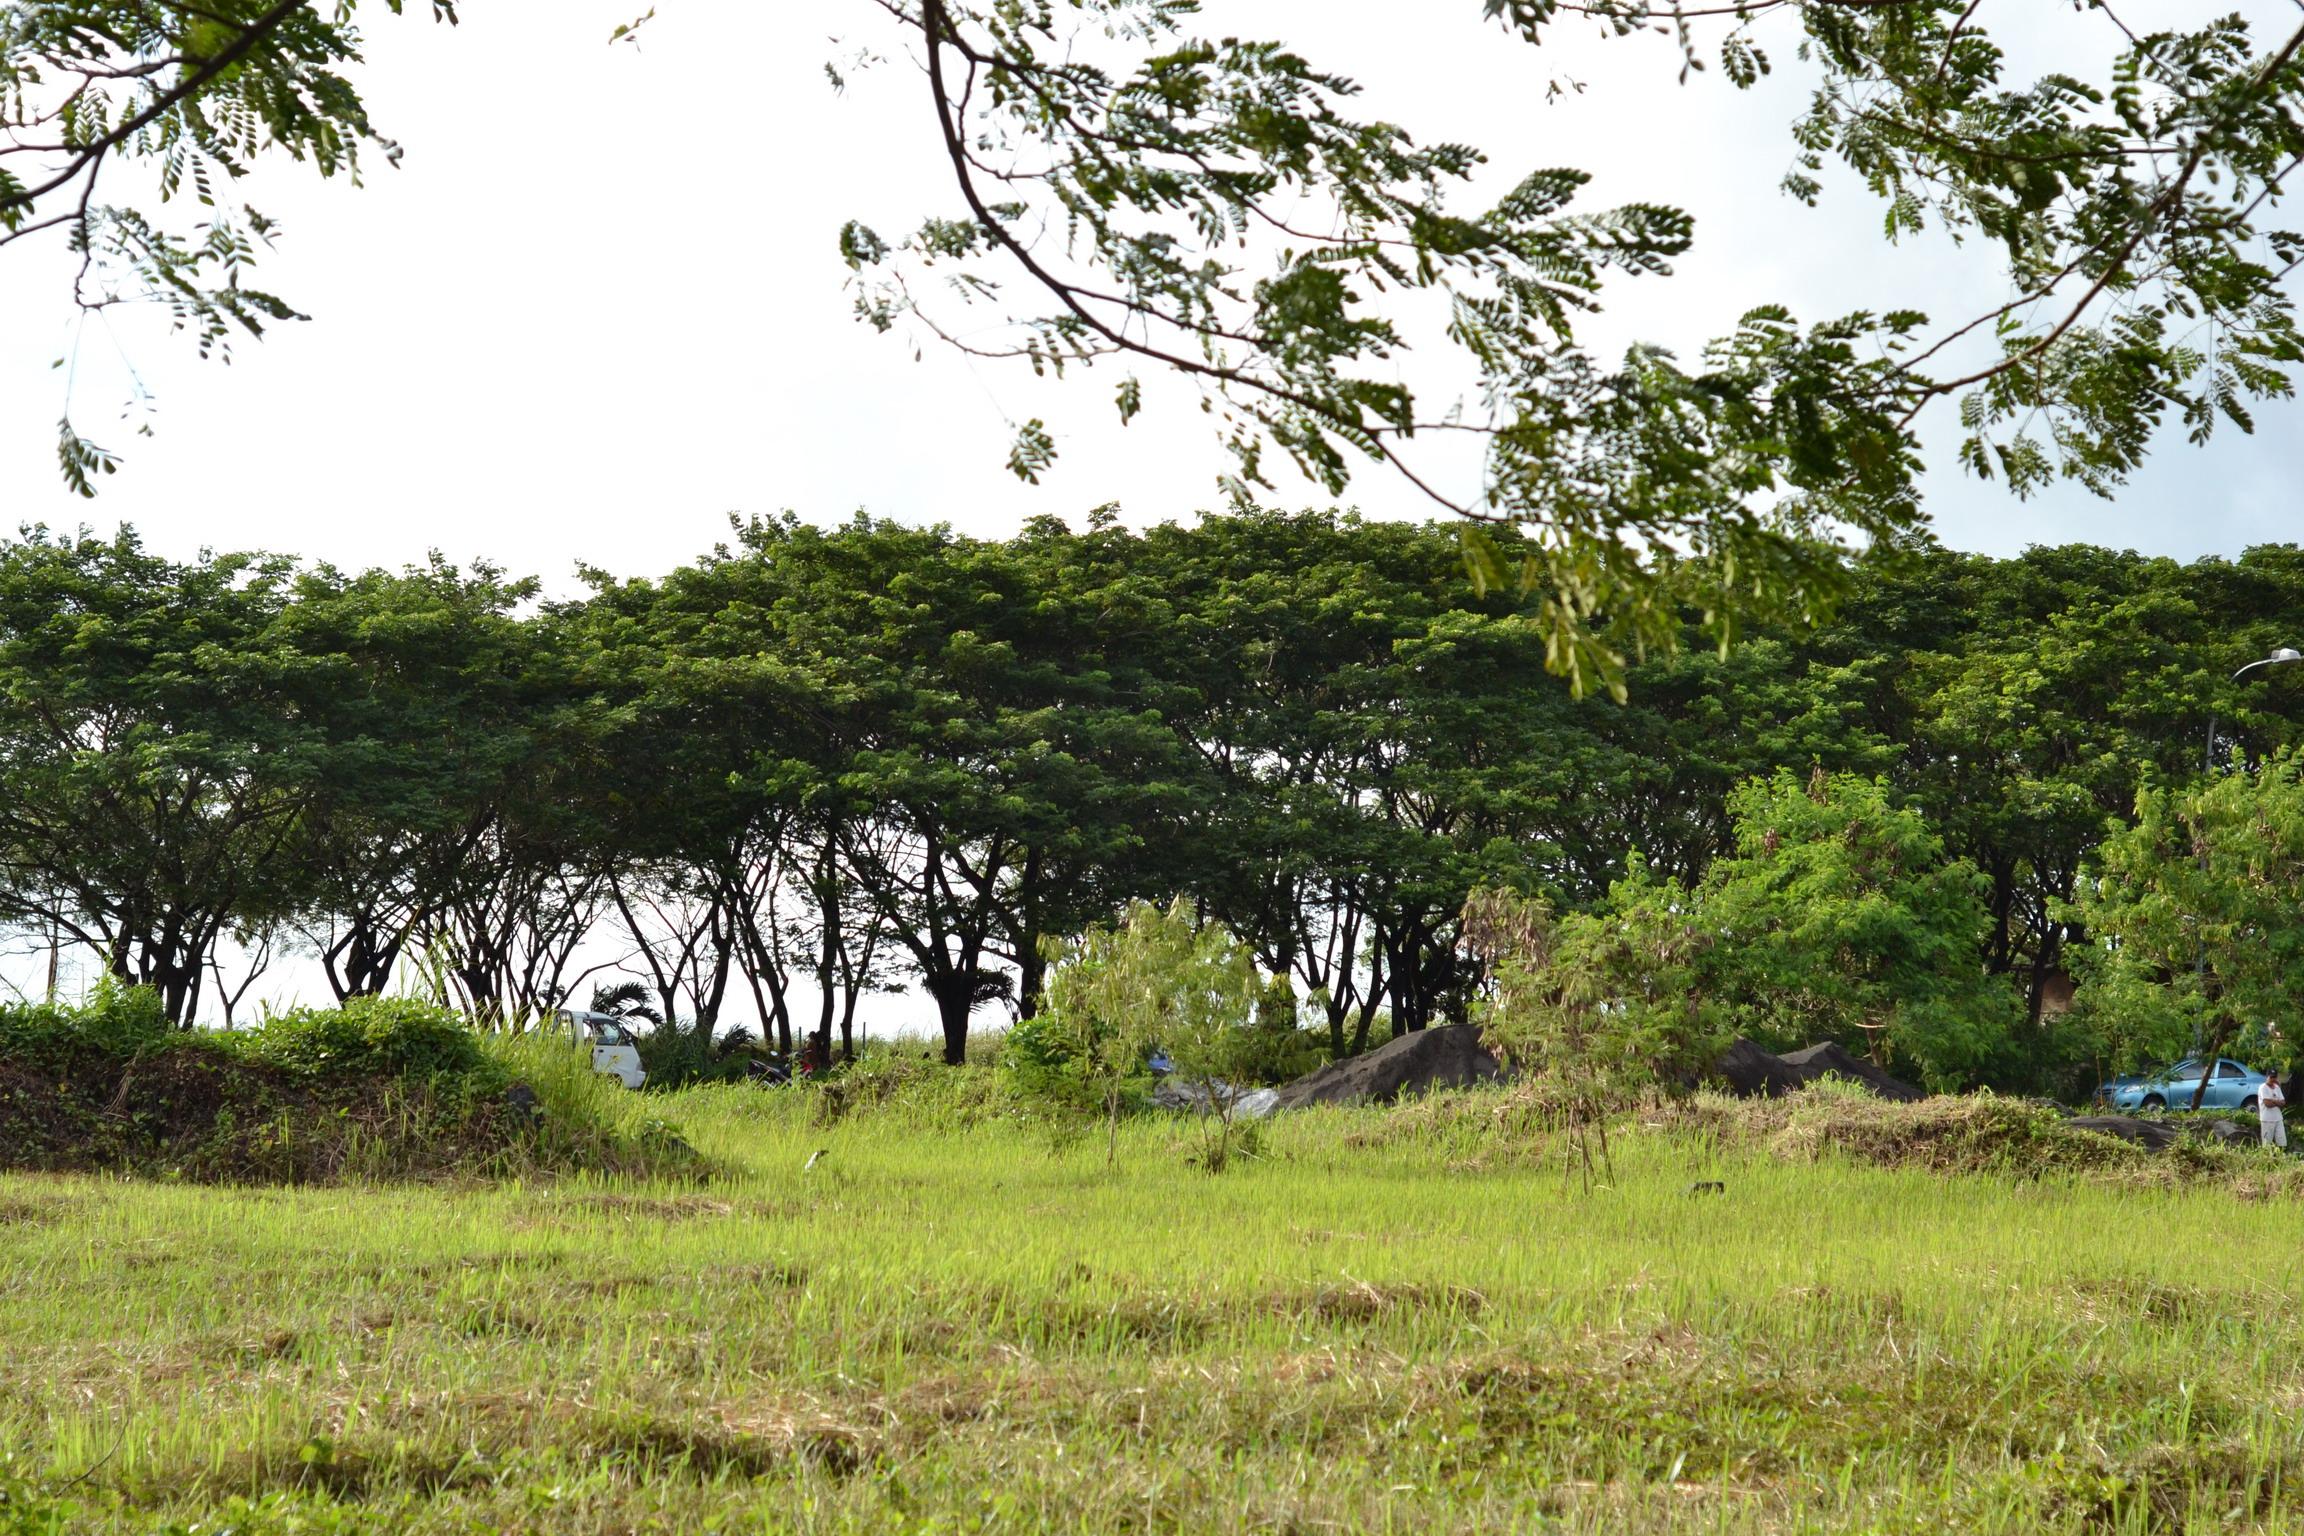 Green Trees, Beautiful, Branch, Grass, Green, HQ Photo